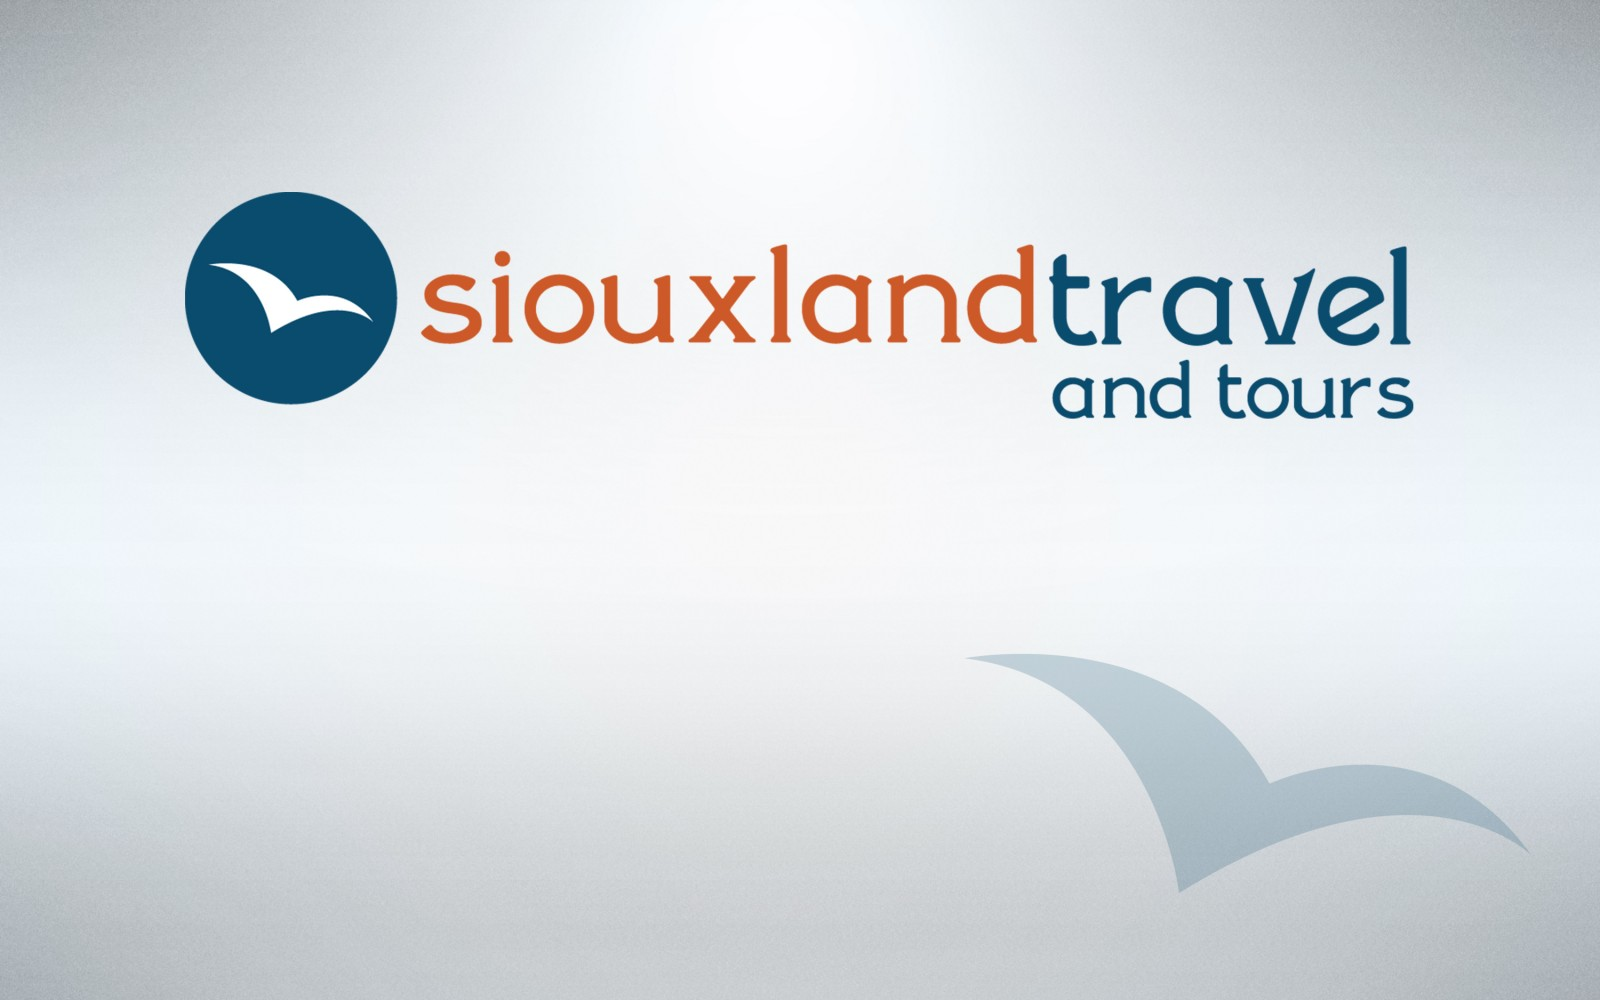 Siouxland Travel